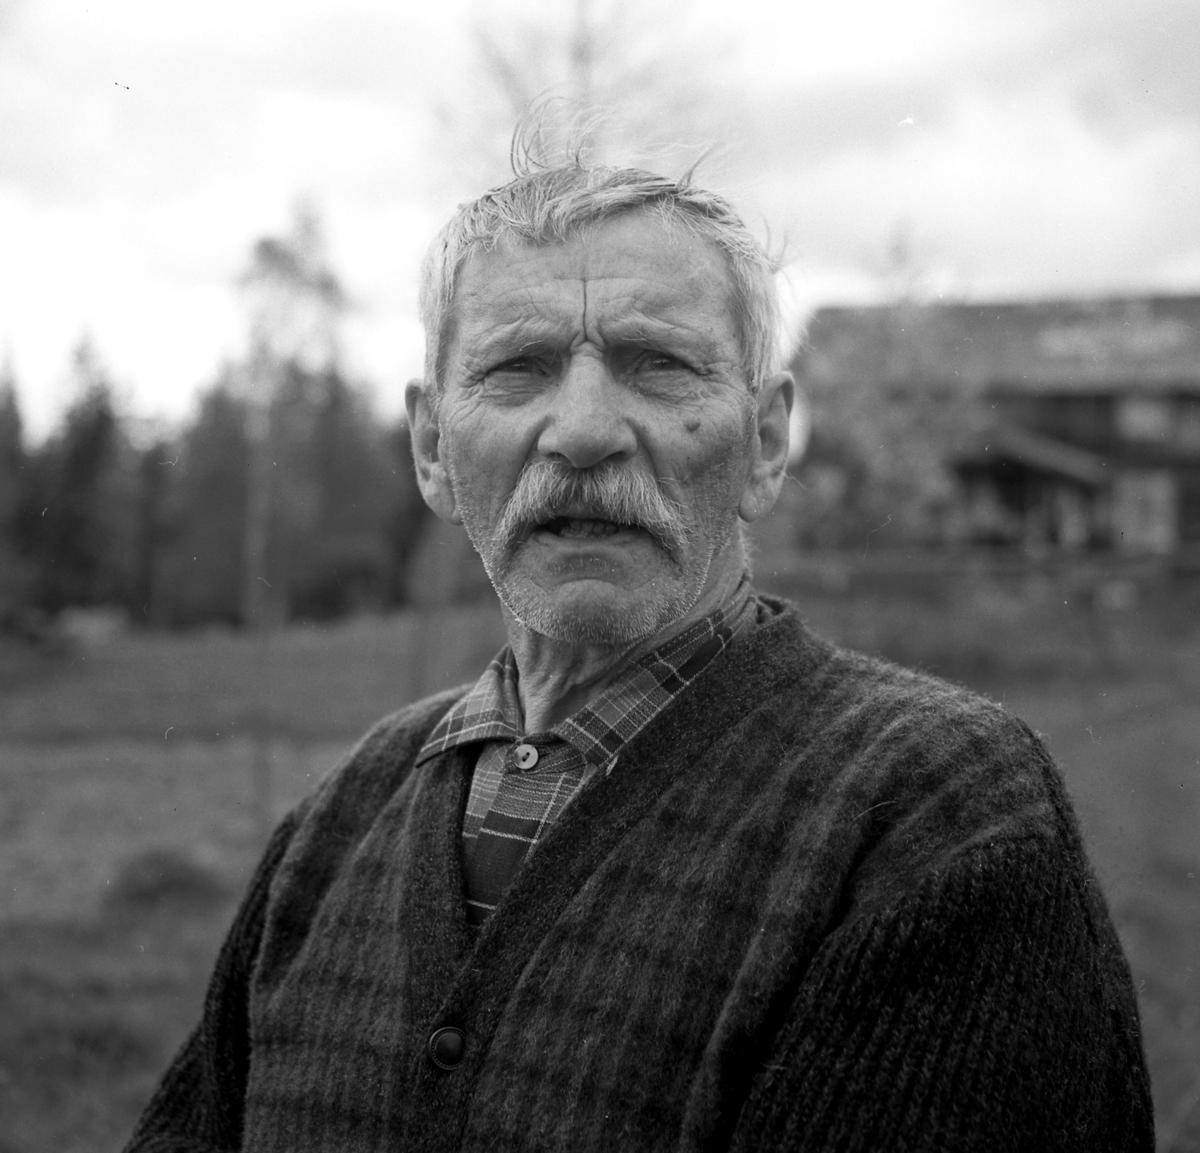 Olaf Heggbrenna